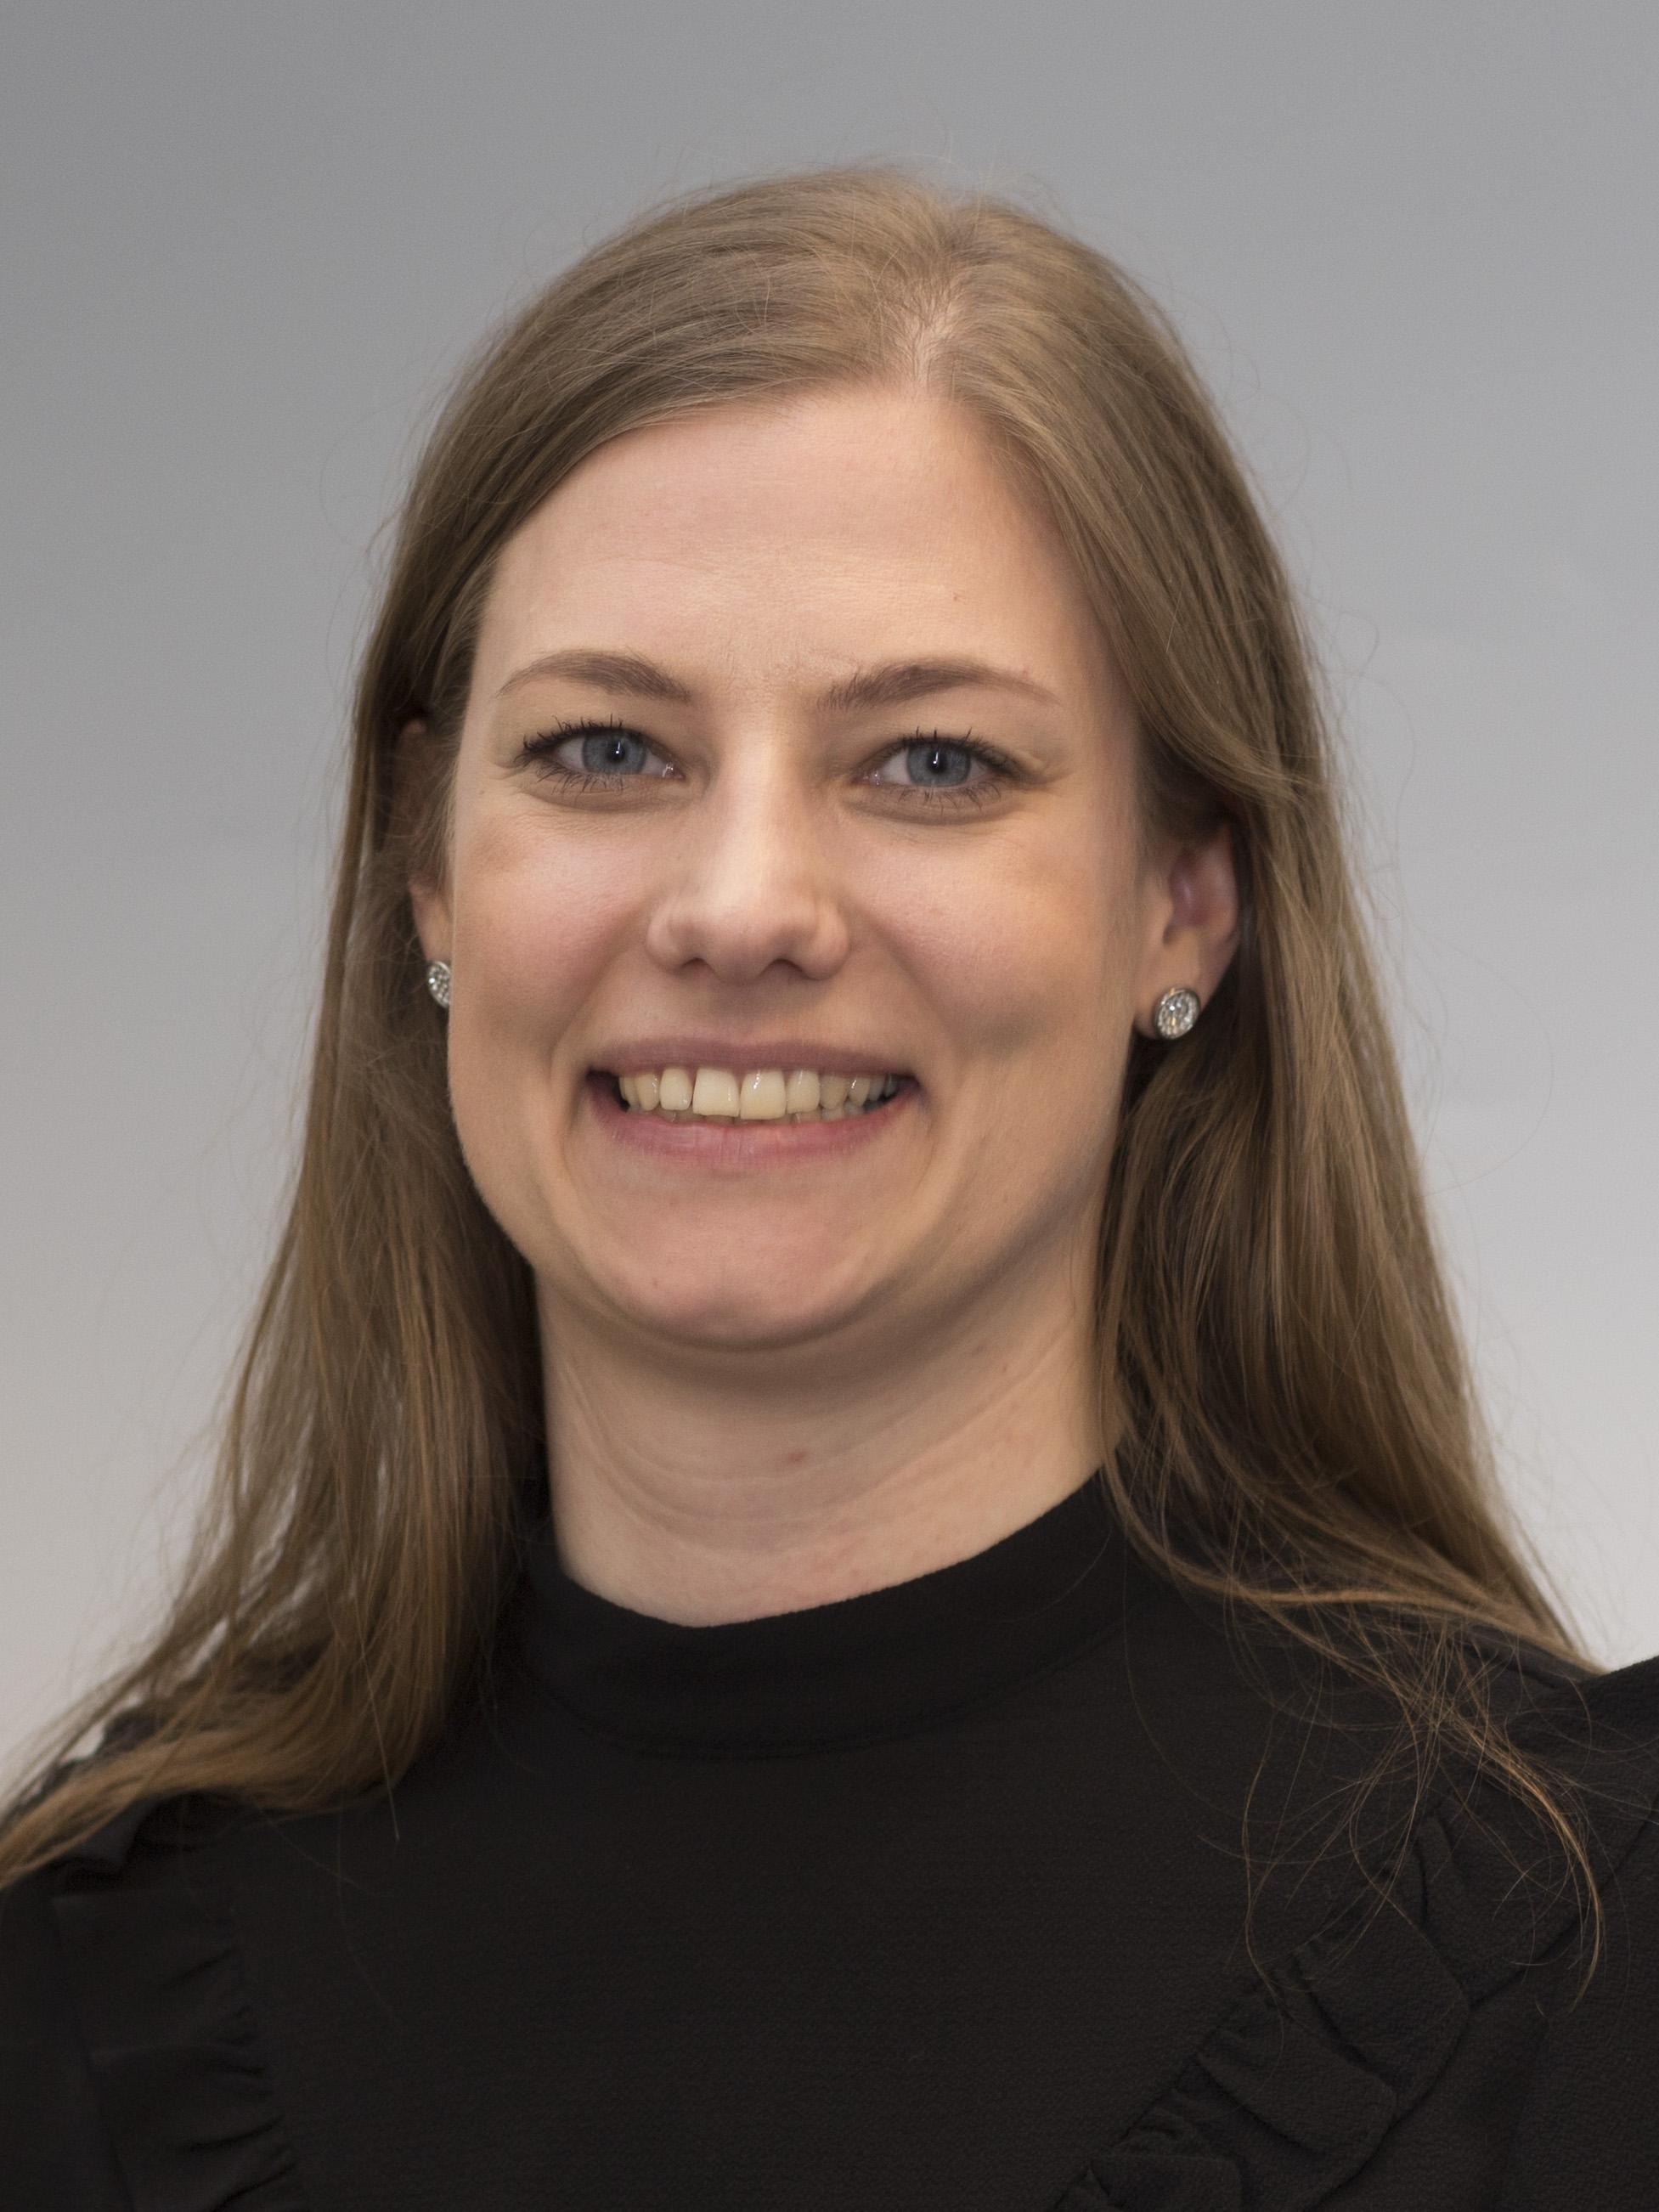 Jeannette Guldborg Petersen